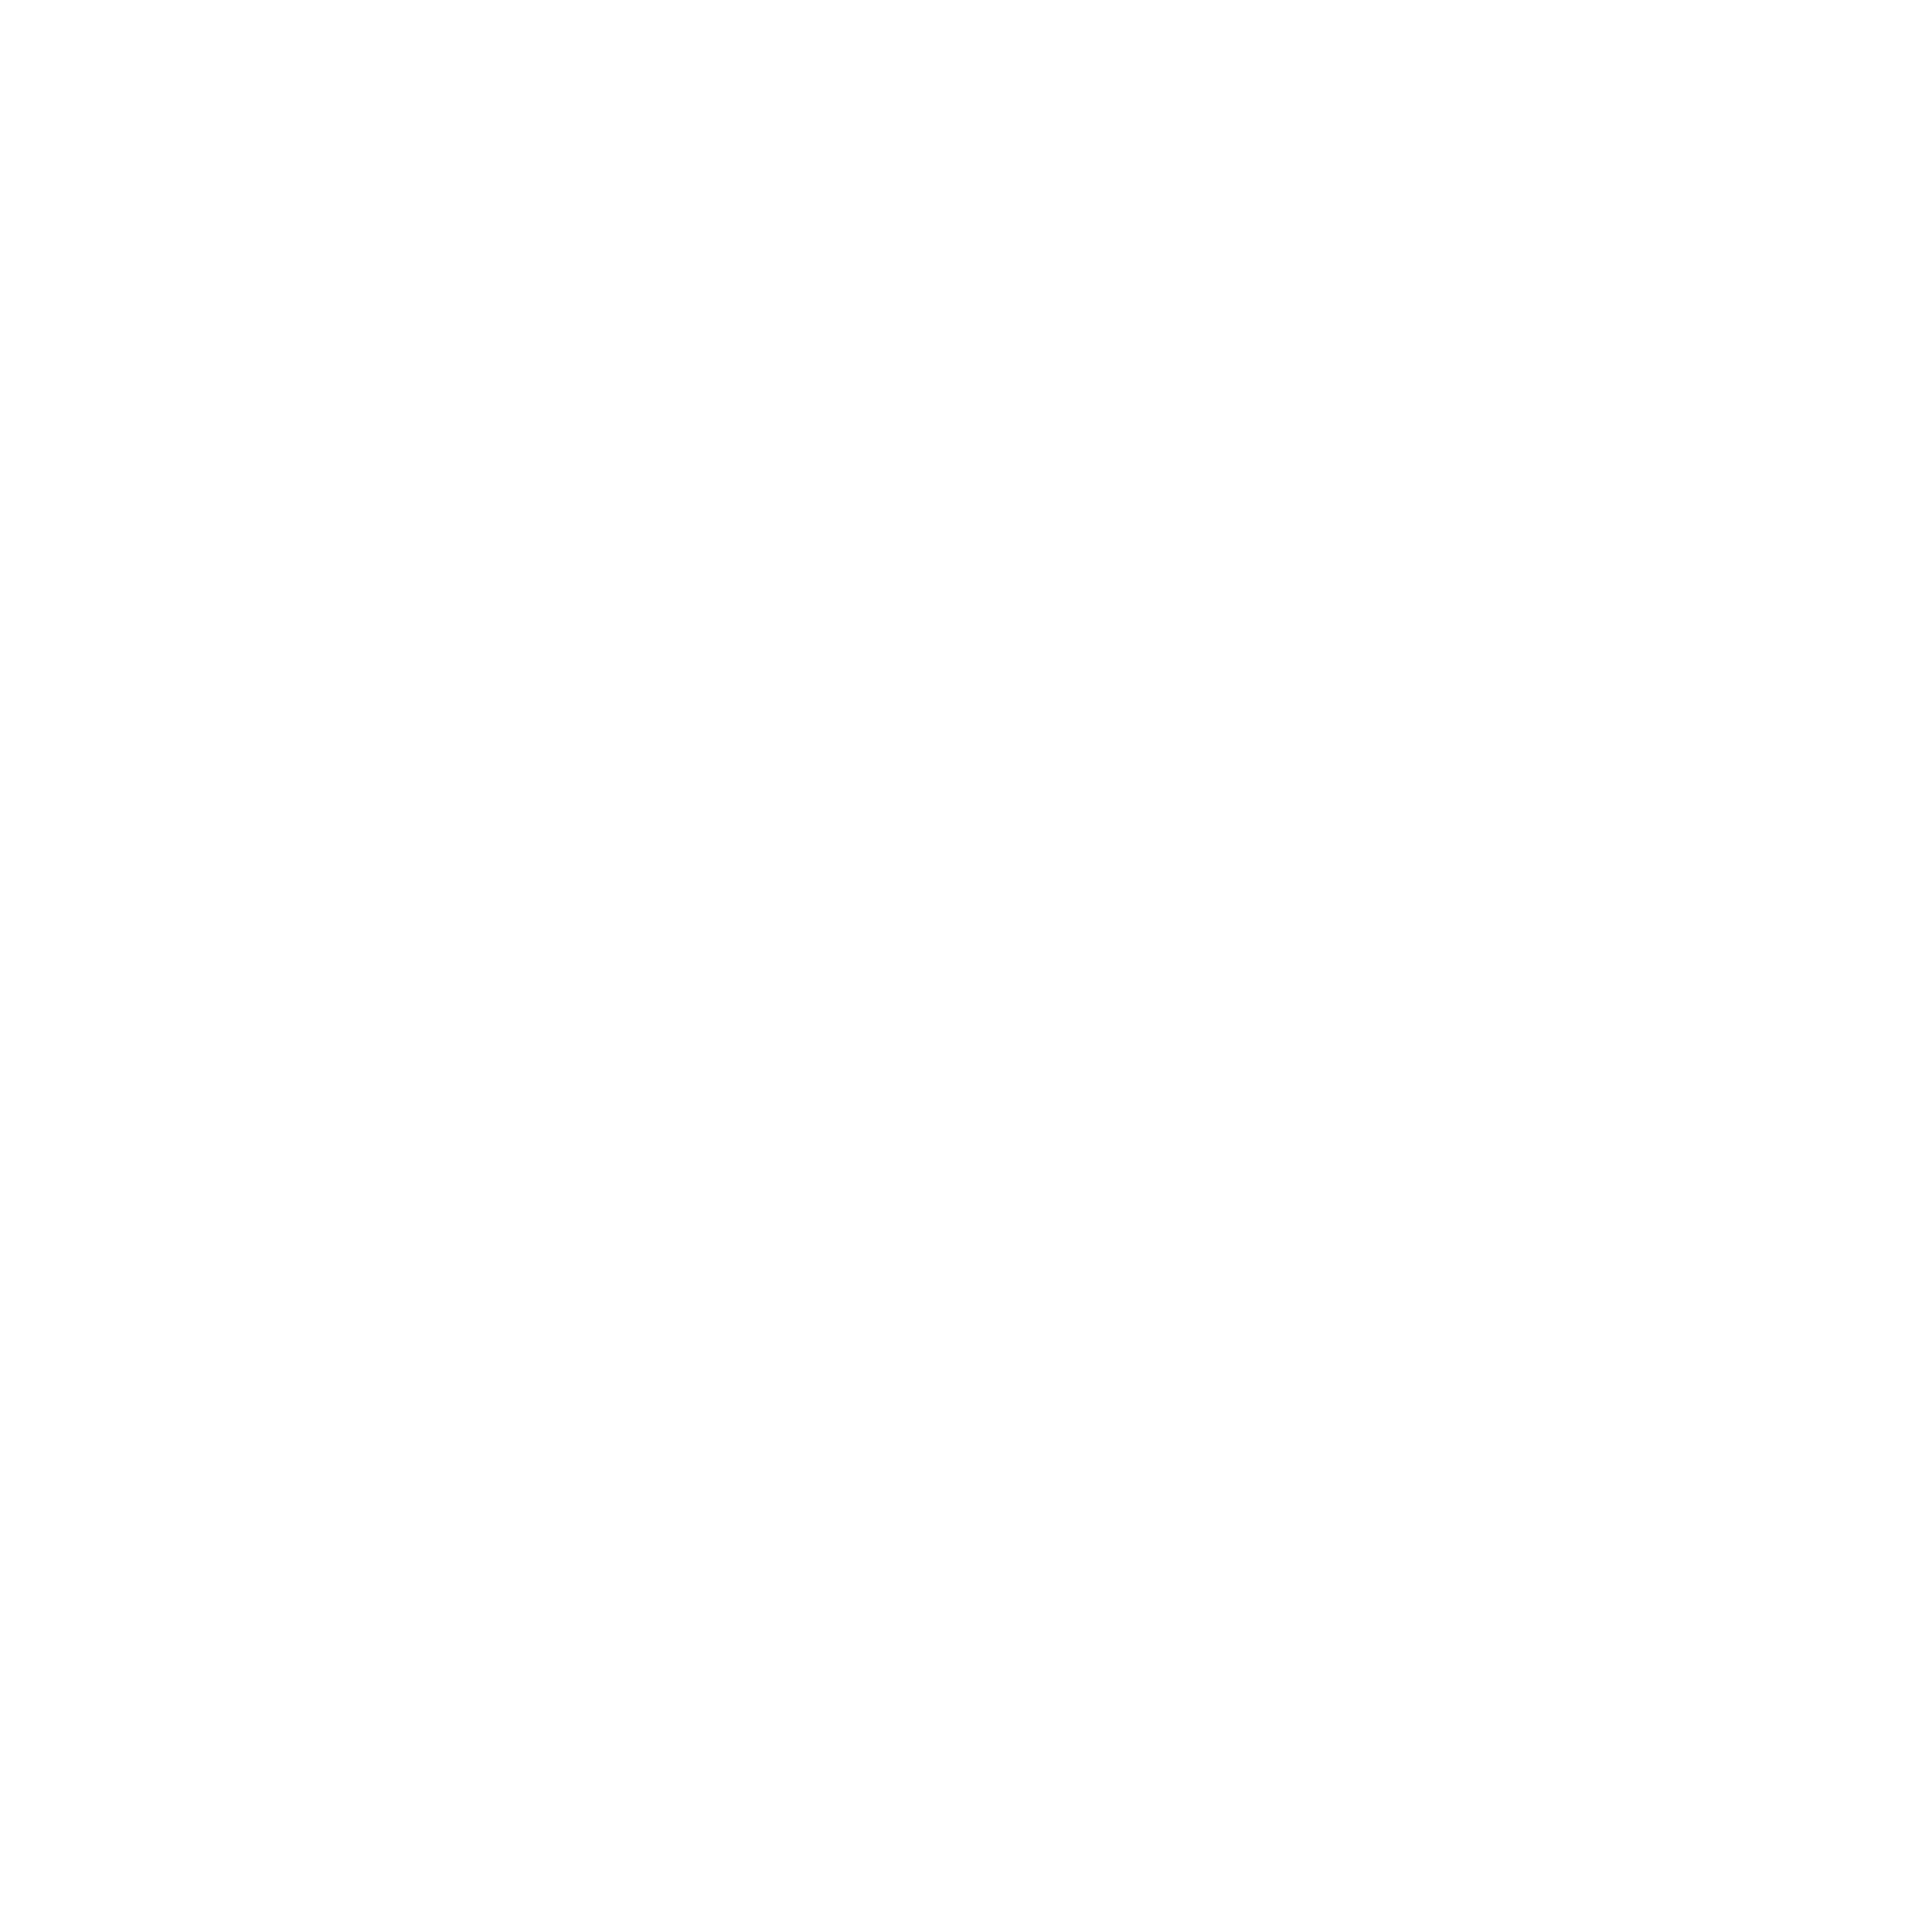 Integrity Taxation Digital Partners Futrli